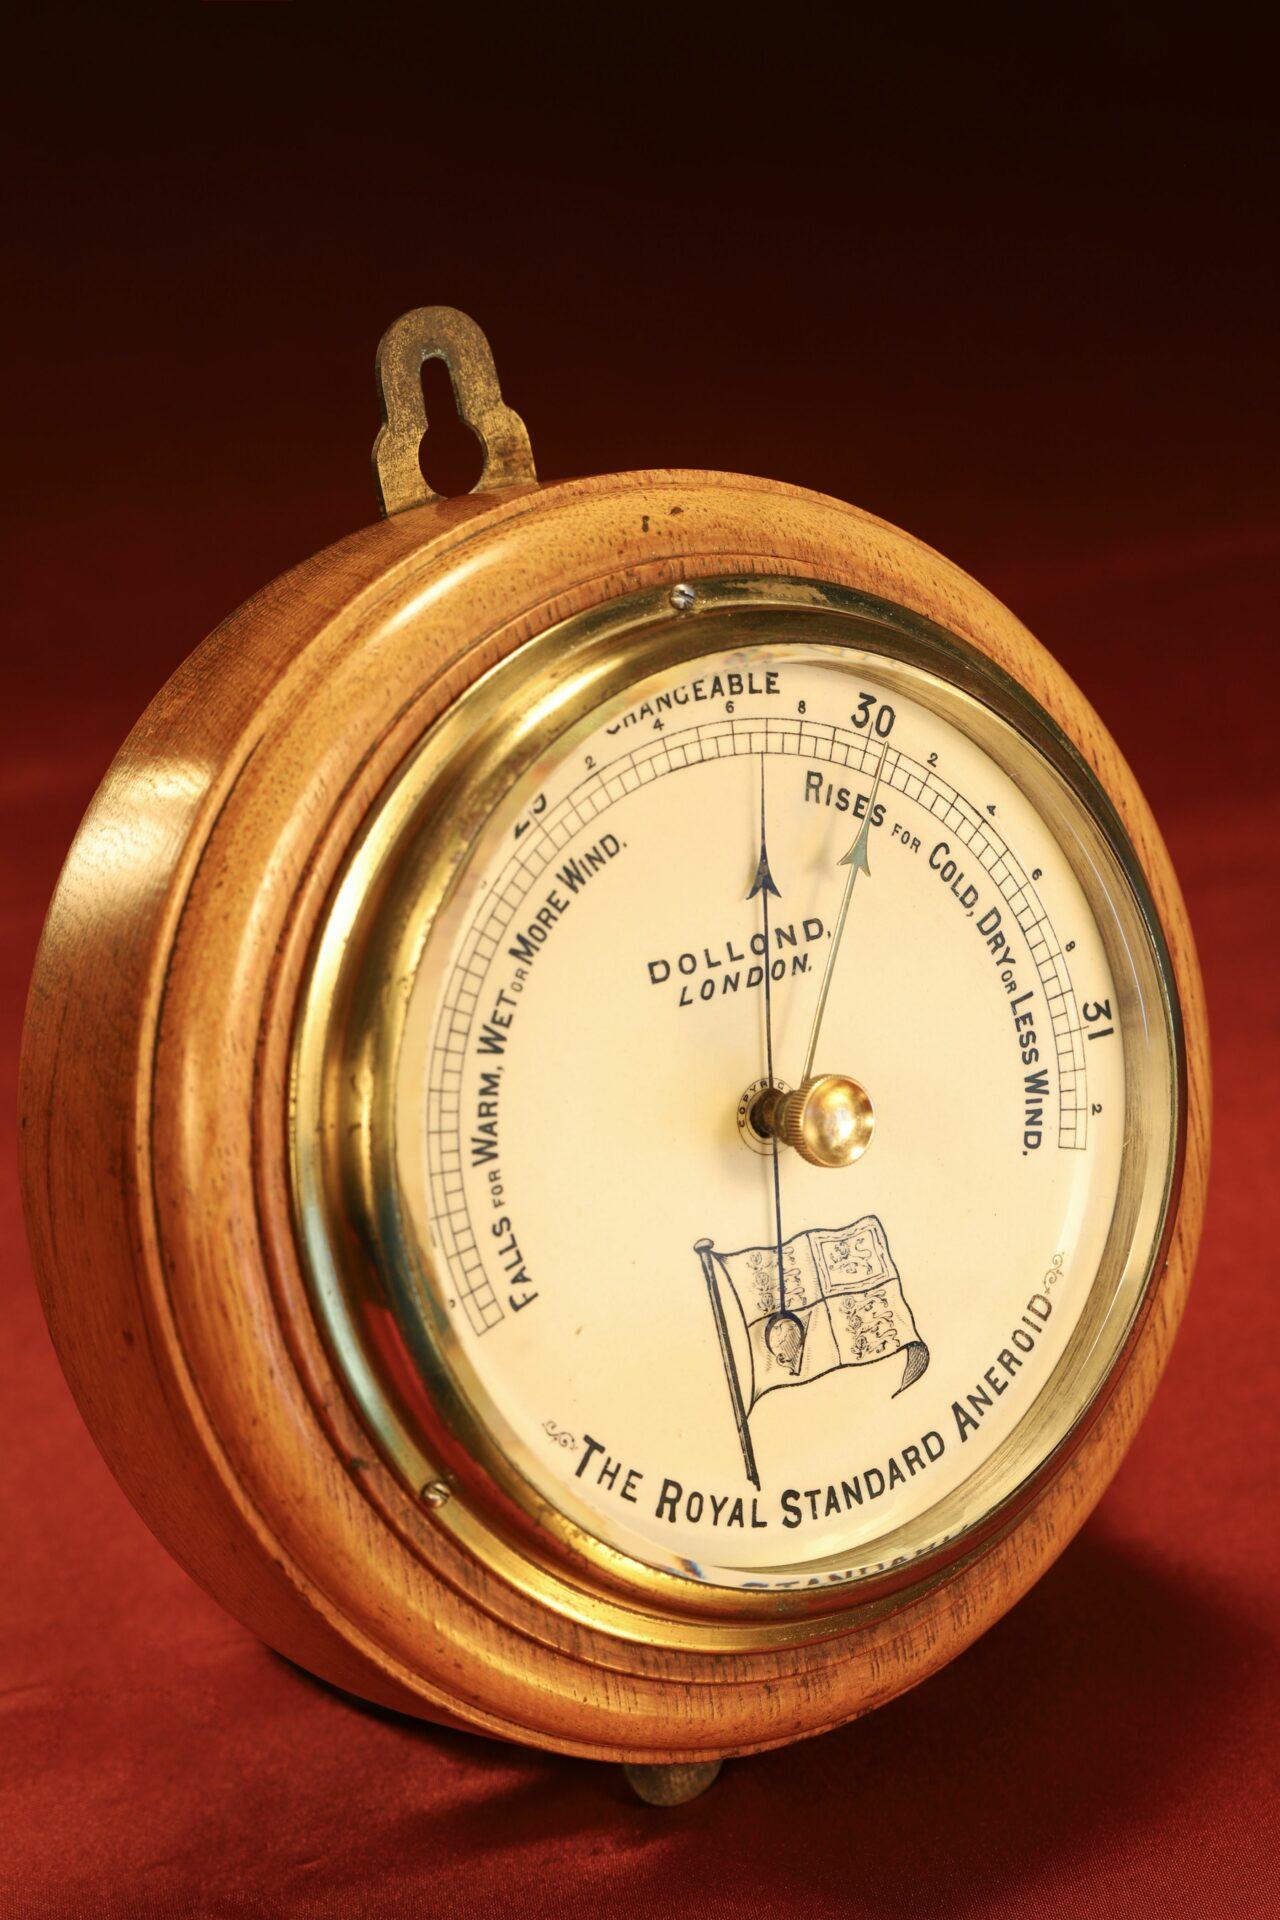 Image of Dollond Royal Standard Marine Barometer c1880 taken from lefthand side